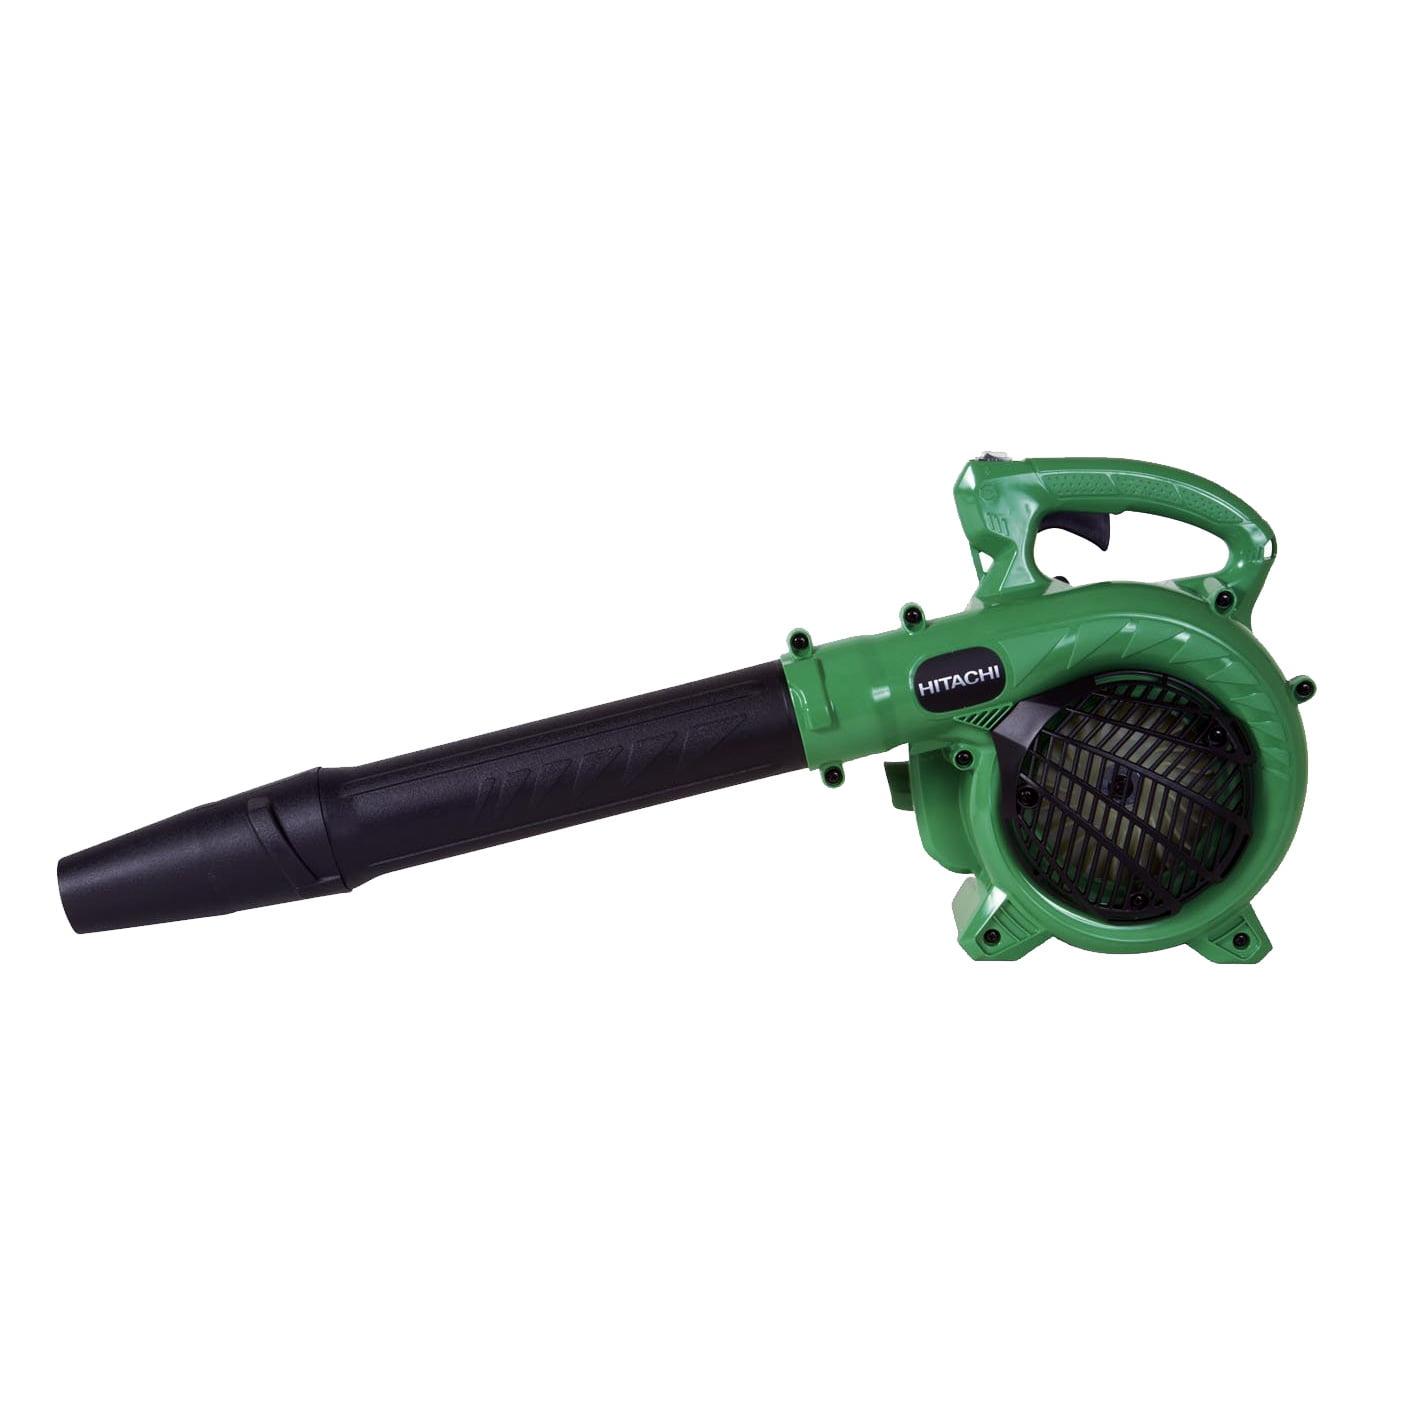 Hitachi RB24EAP 23.9cc Gas Handheld Blower OB Open Box by Hitachi Power Tools